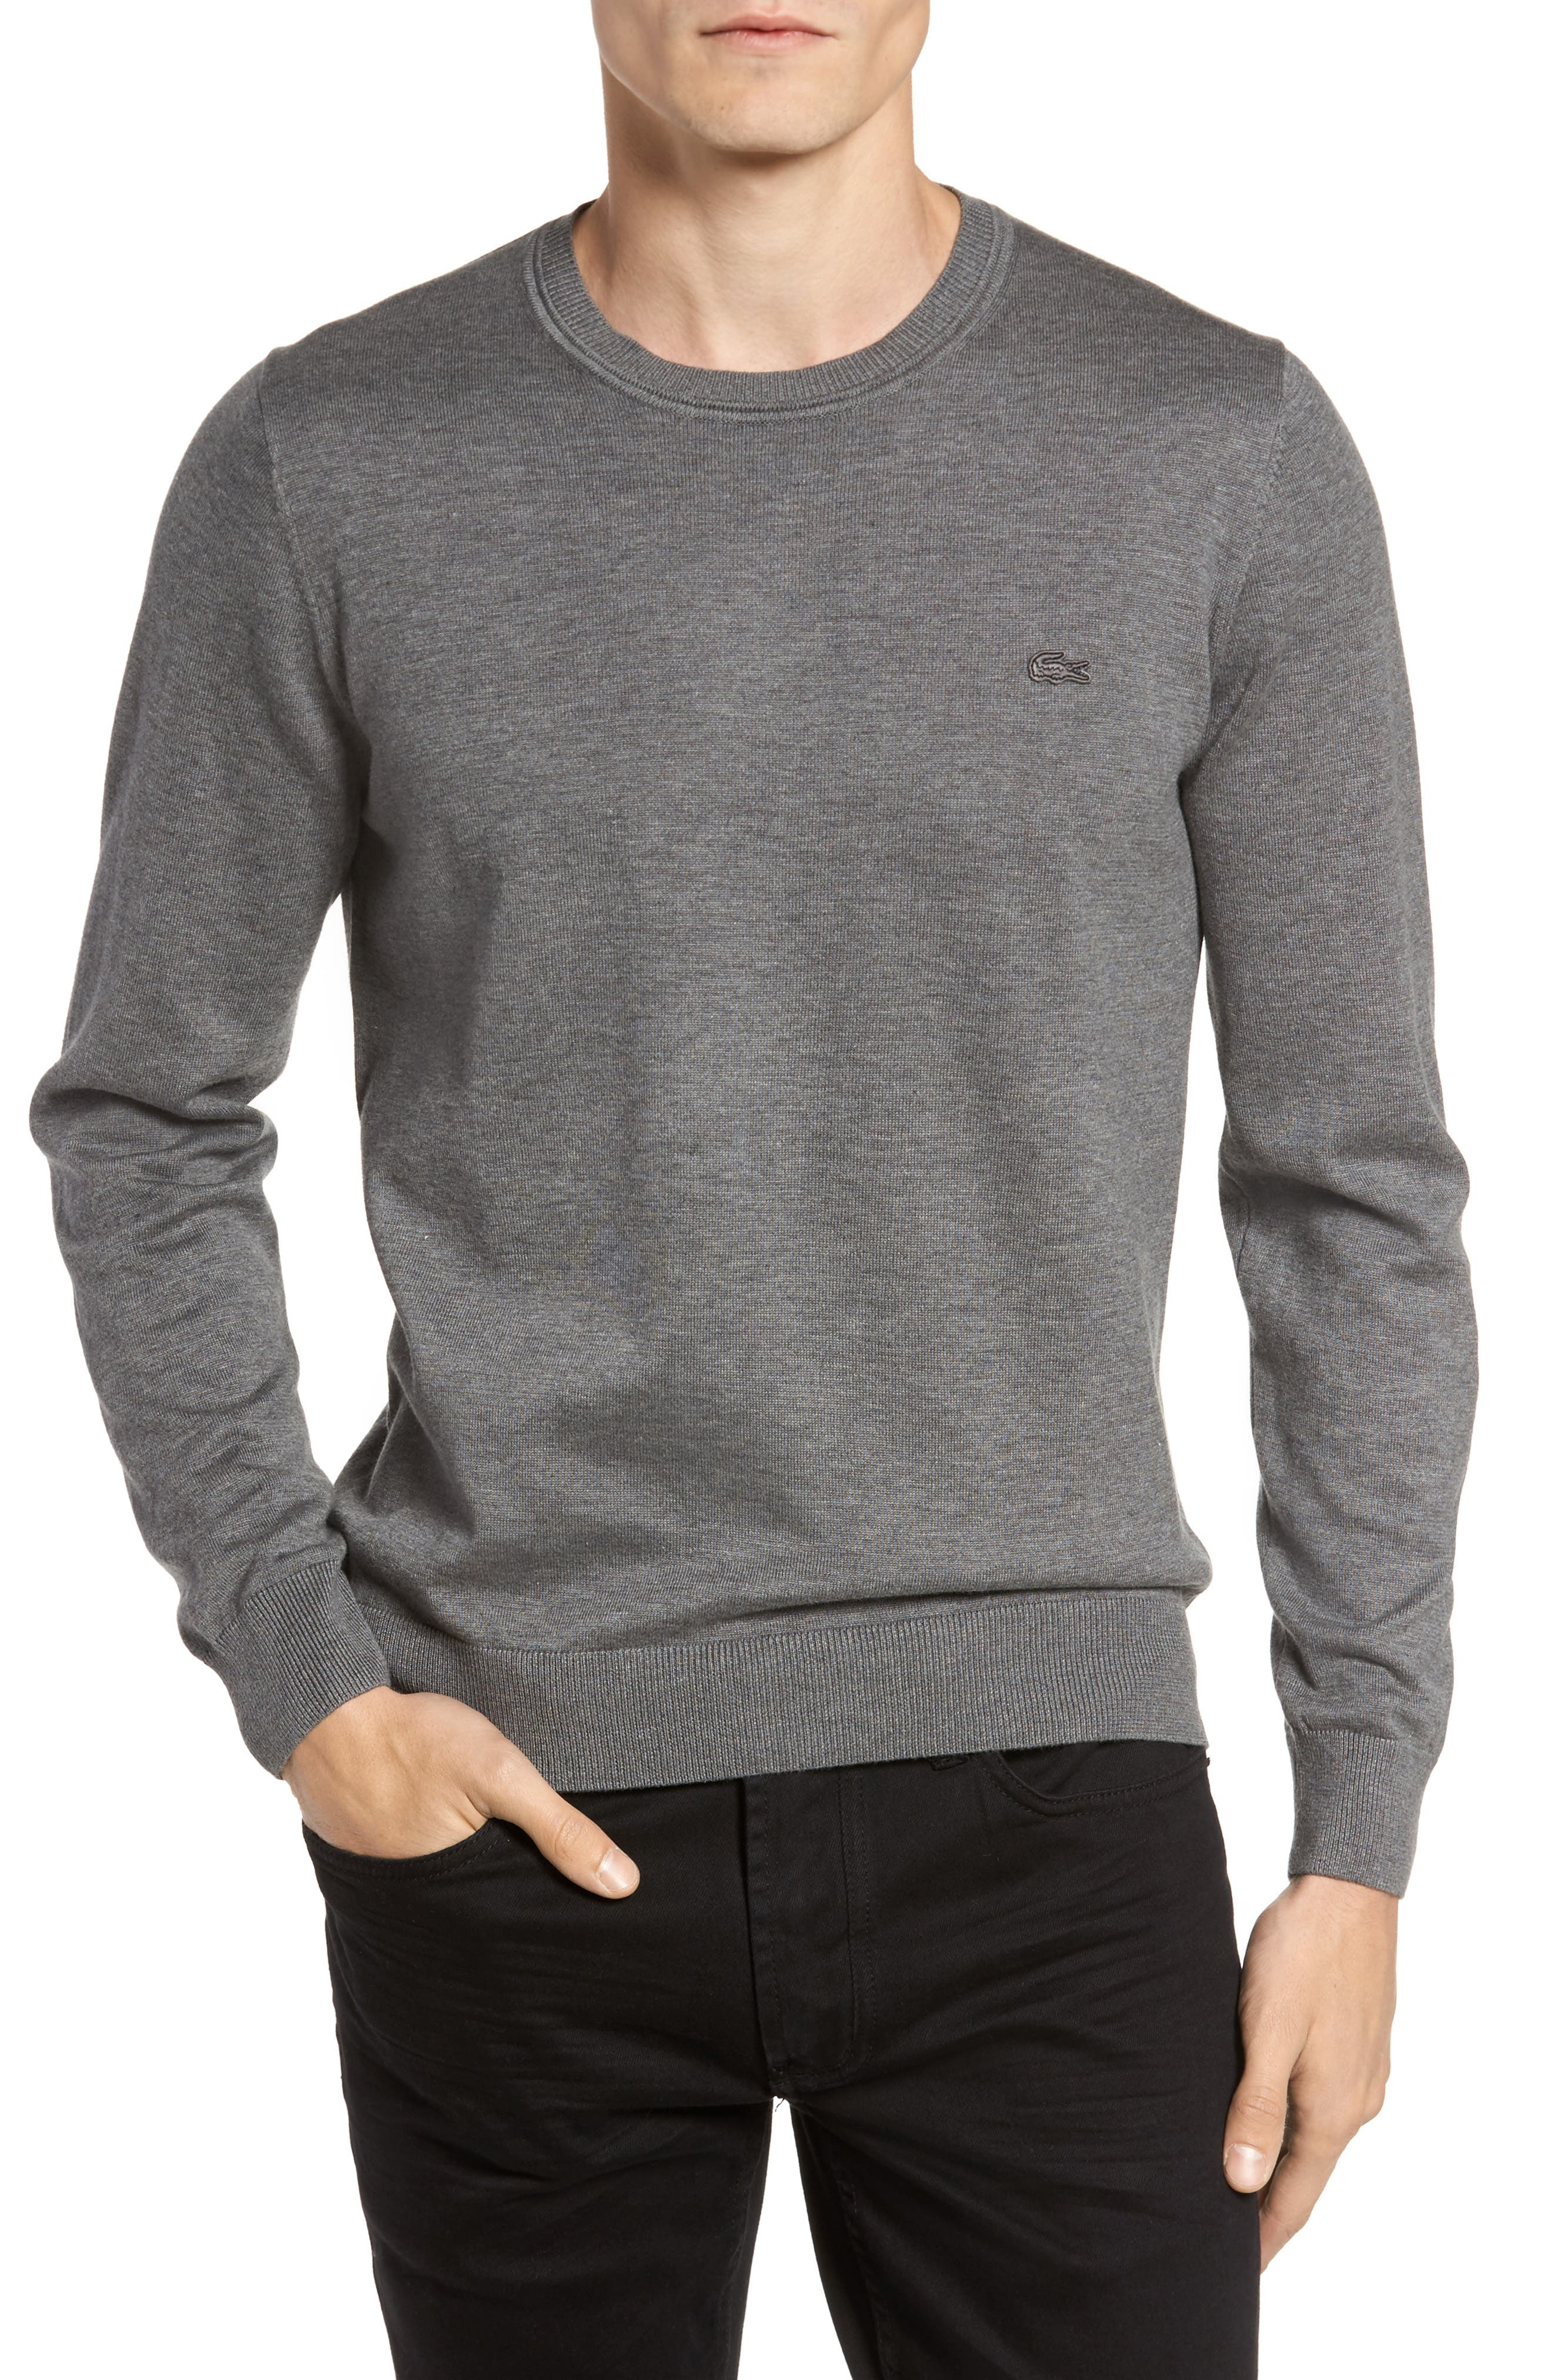 Jersey Knit Crewneck Sweater,                             Main thumbnail 1, color,                             032